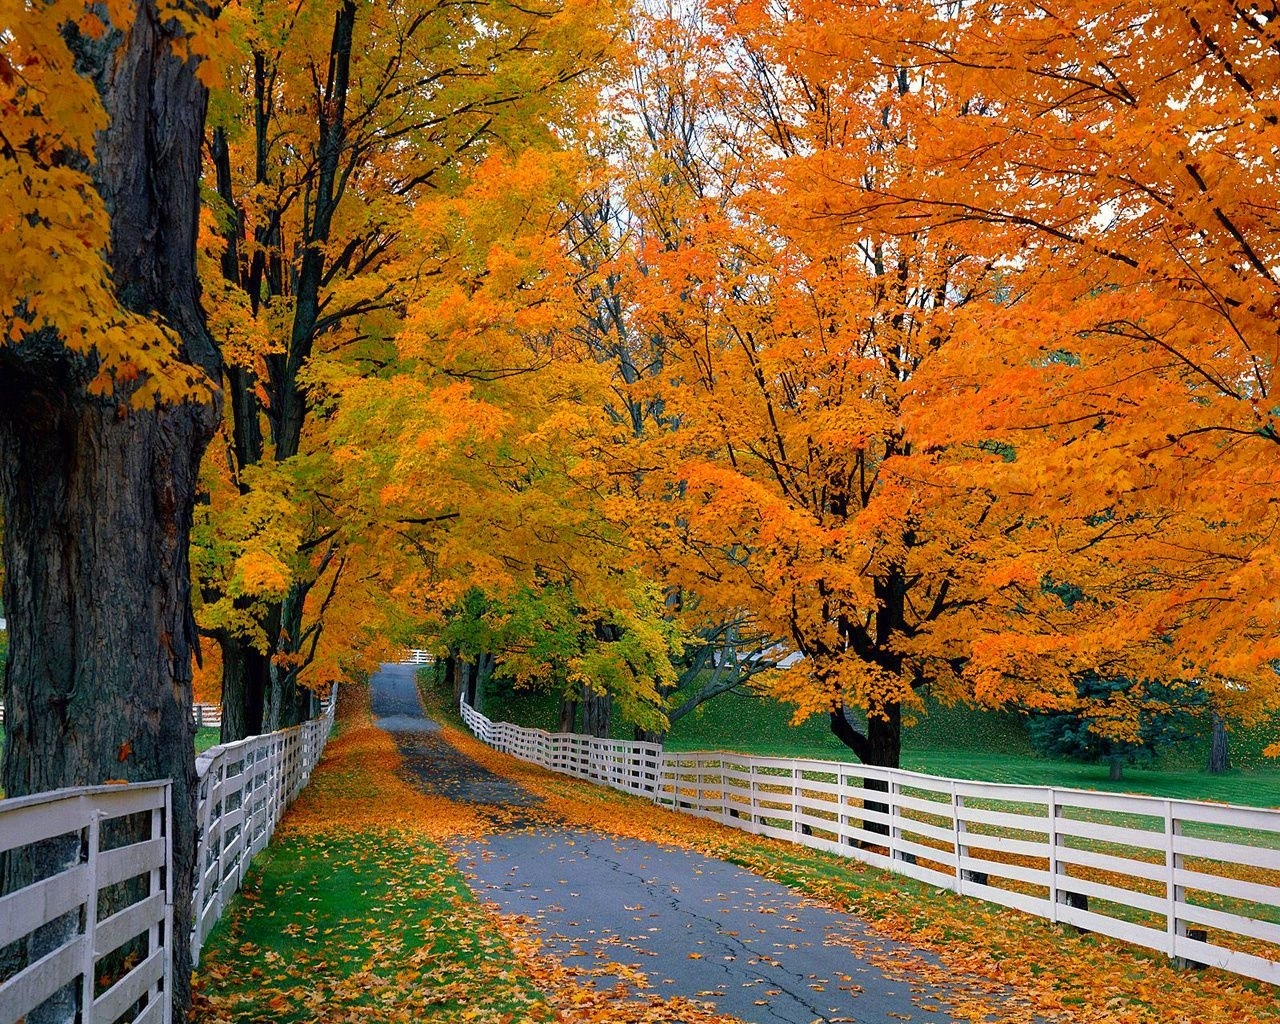 fall leaves desktop wallpapers free download - live 4k wallpapers